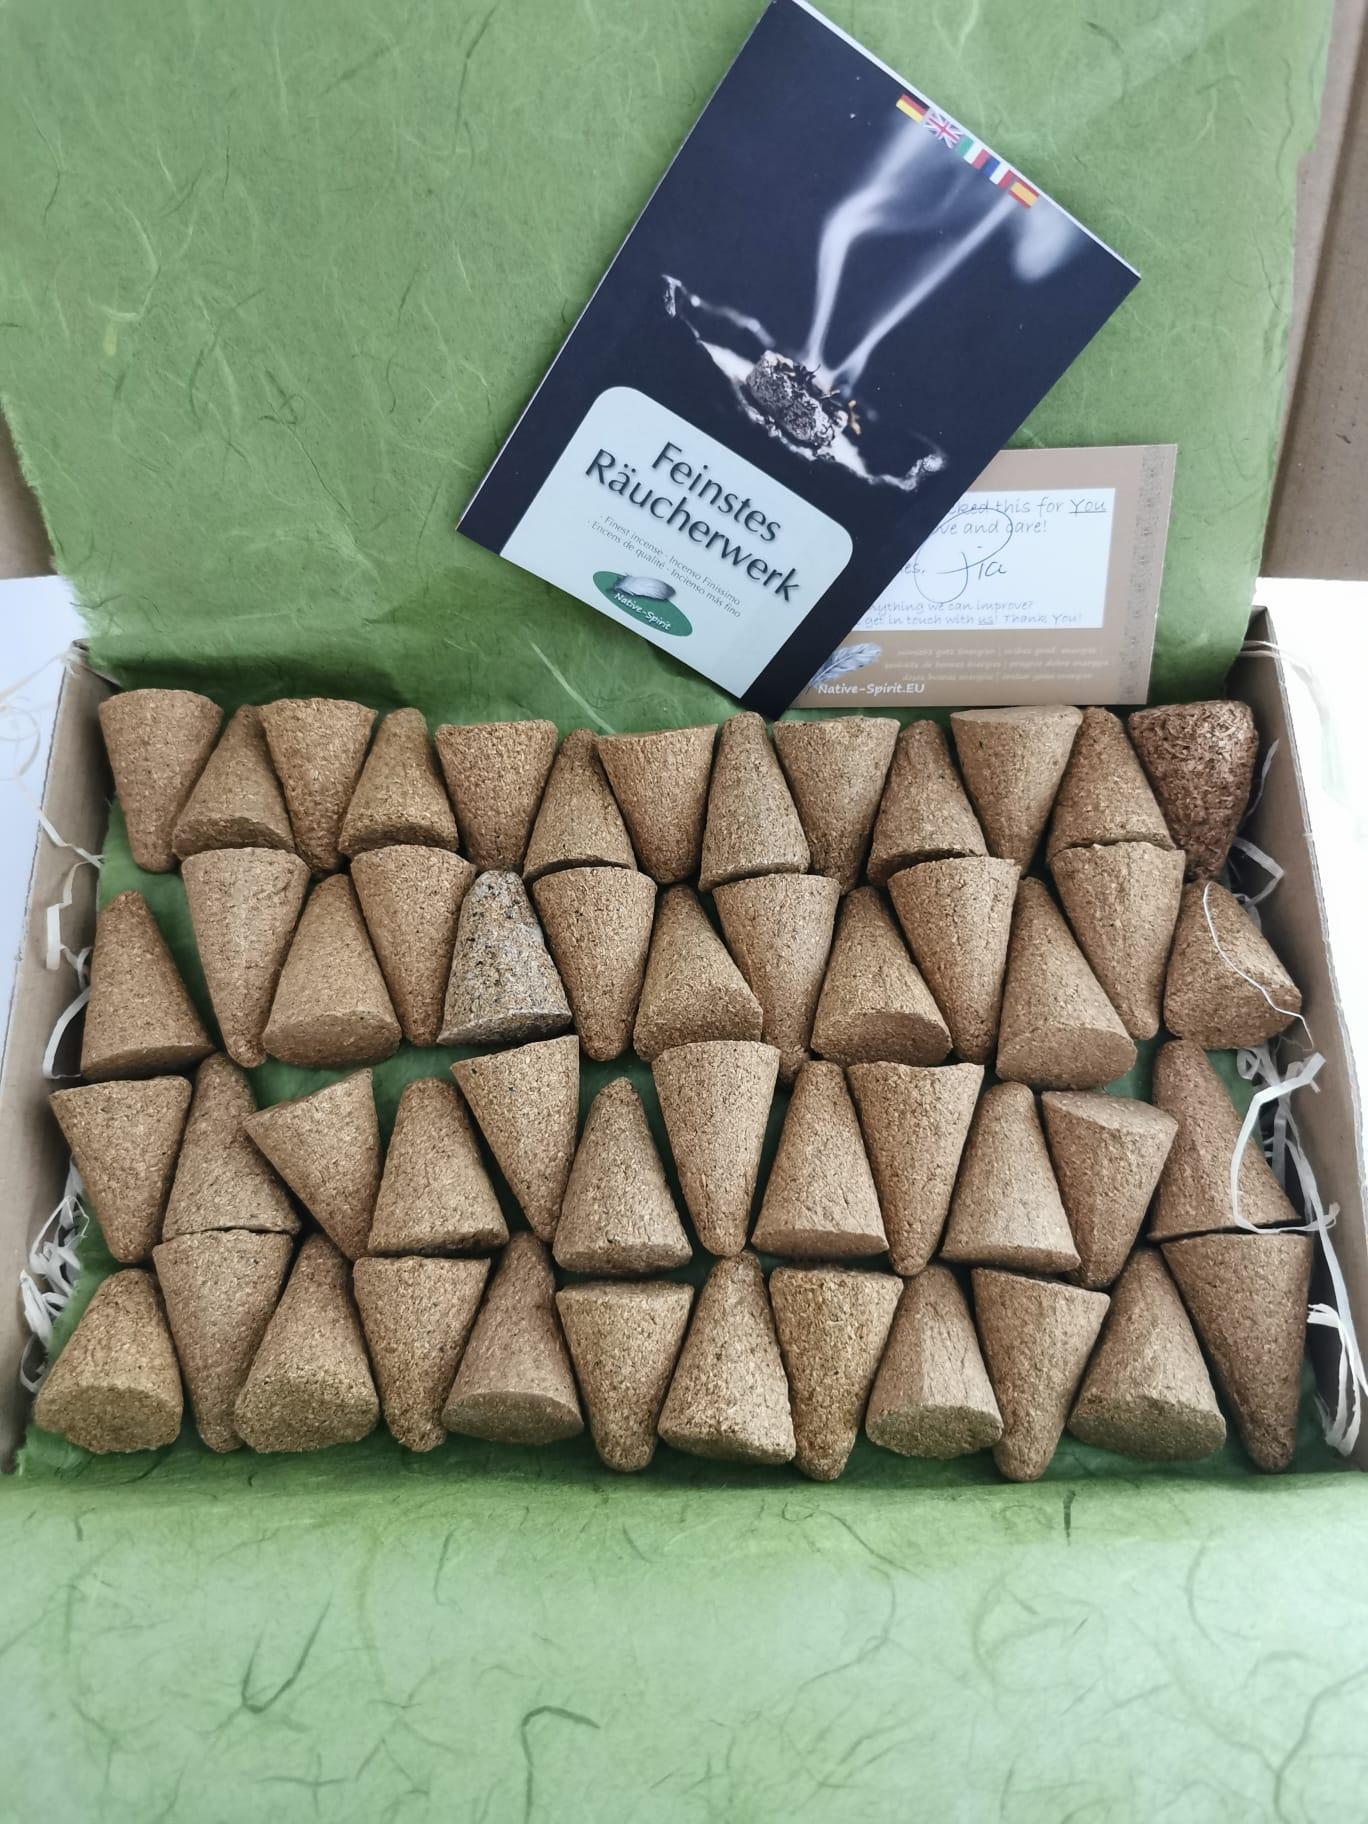 Palo Santo Räucherkegel 50 Stk. je ca. 3,5 - 4 cm, Cones aus dem Heiligen Holz des Palo Santo (bursera graveolens), 100% reine Qualität aus Peru, perfekt für Meditation, Duftzeremonien, Entspannung